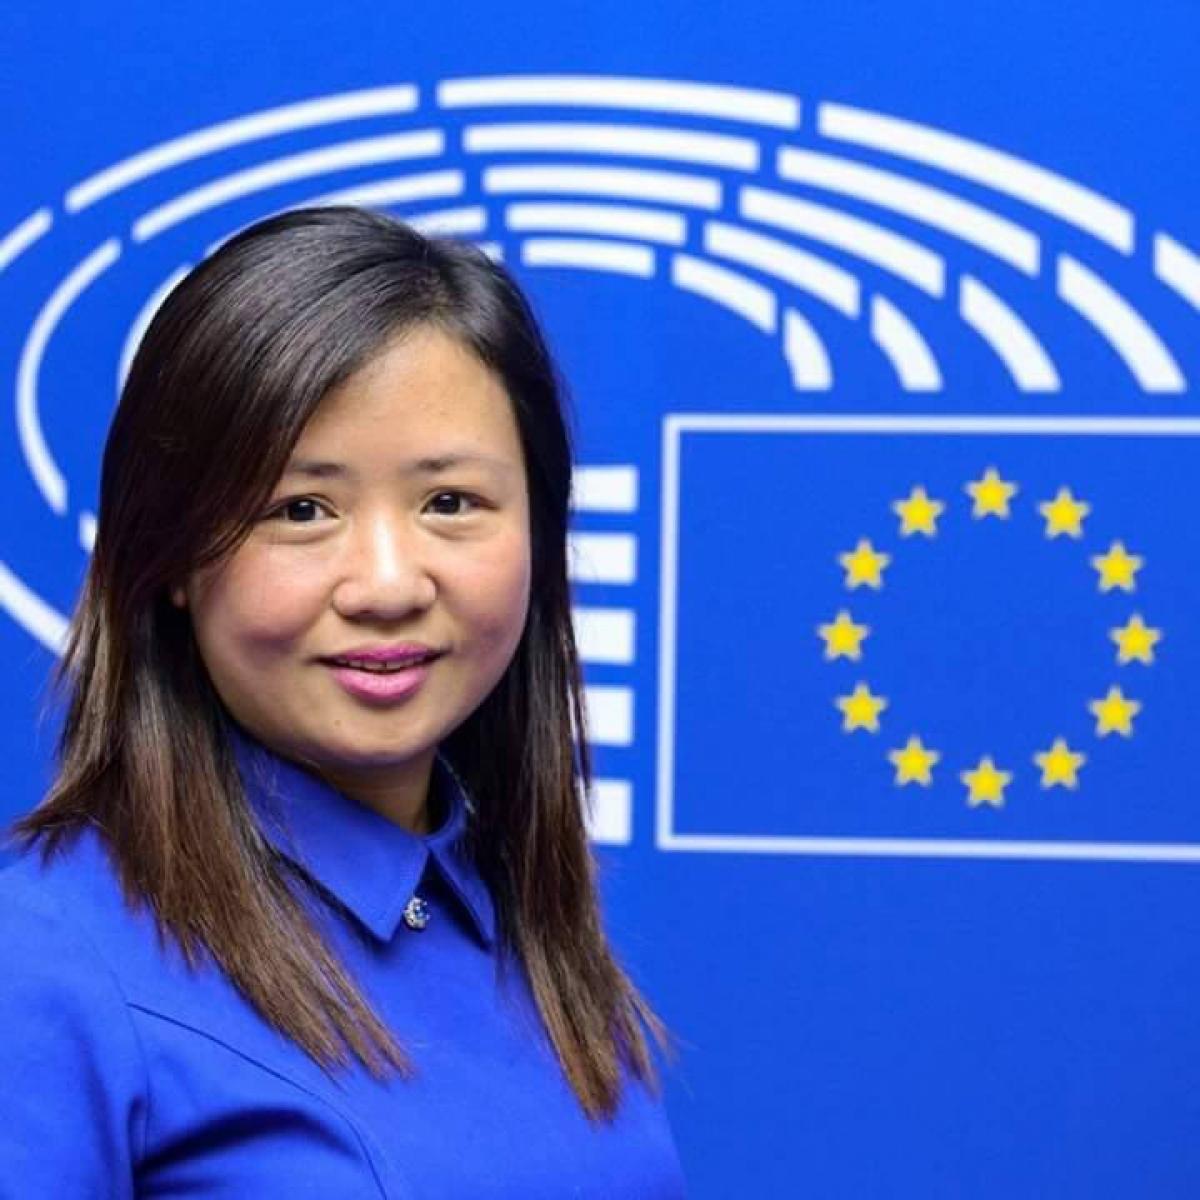 Luật sư Nguyễn Ngọc Lan